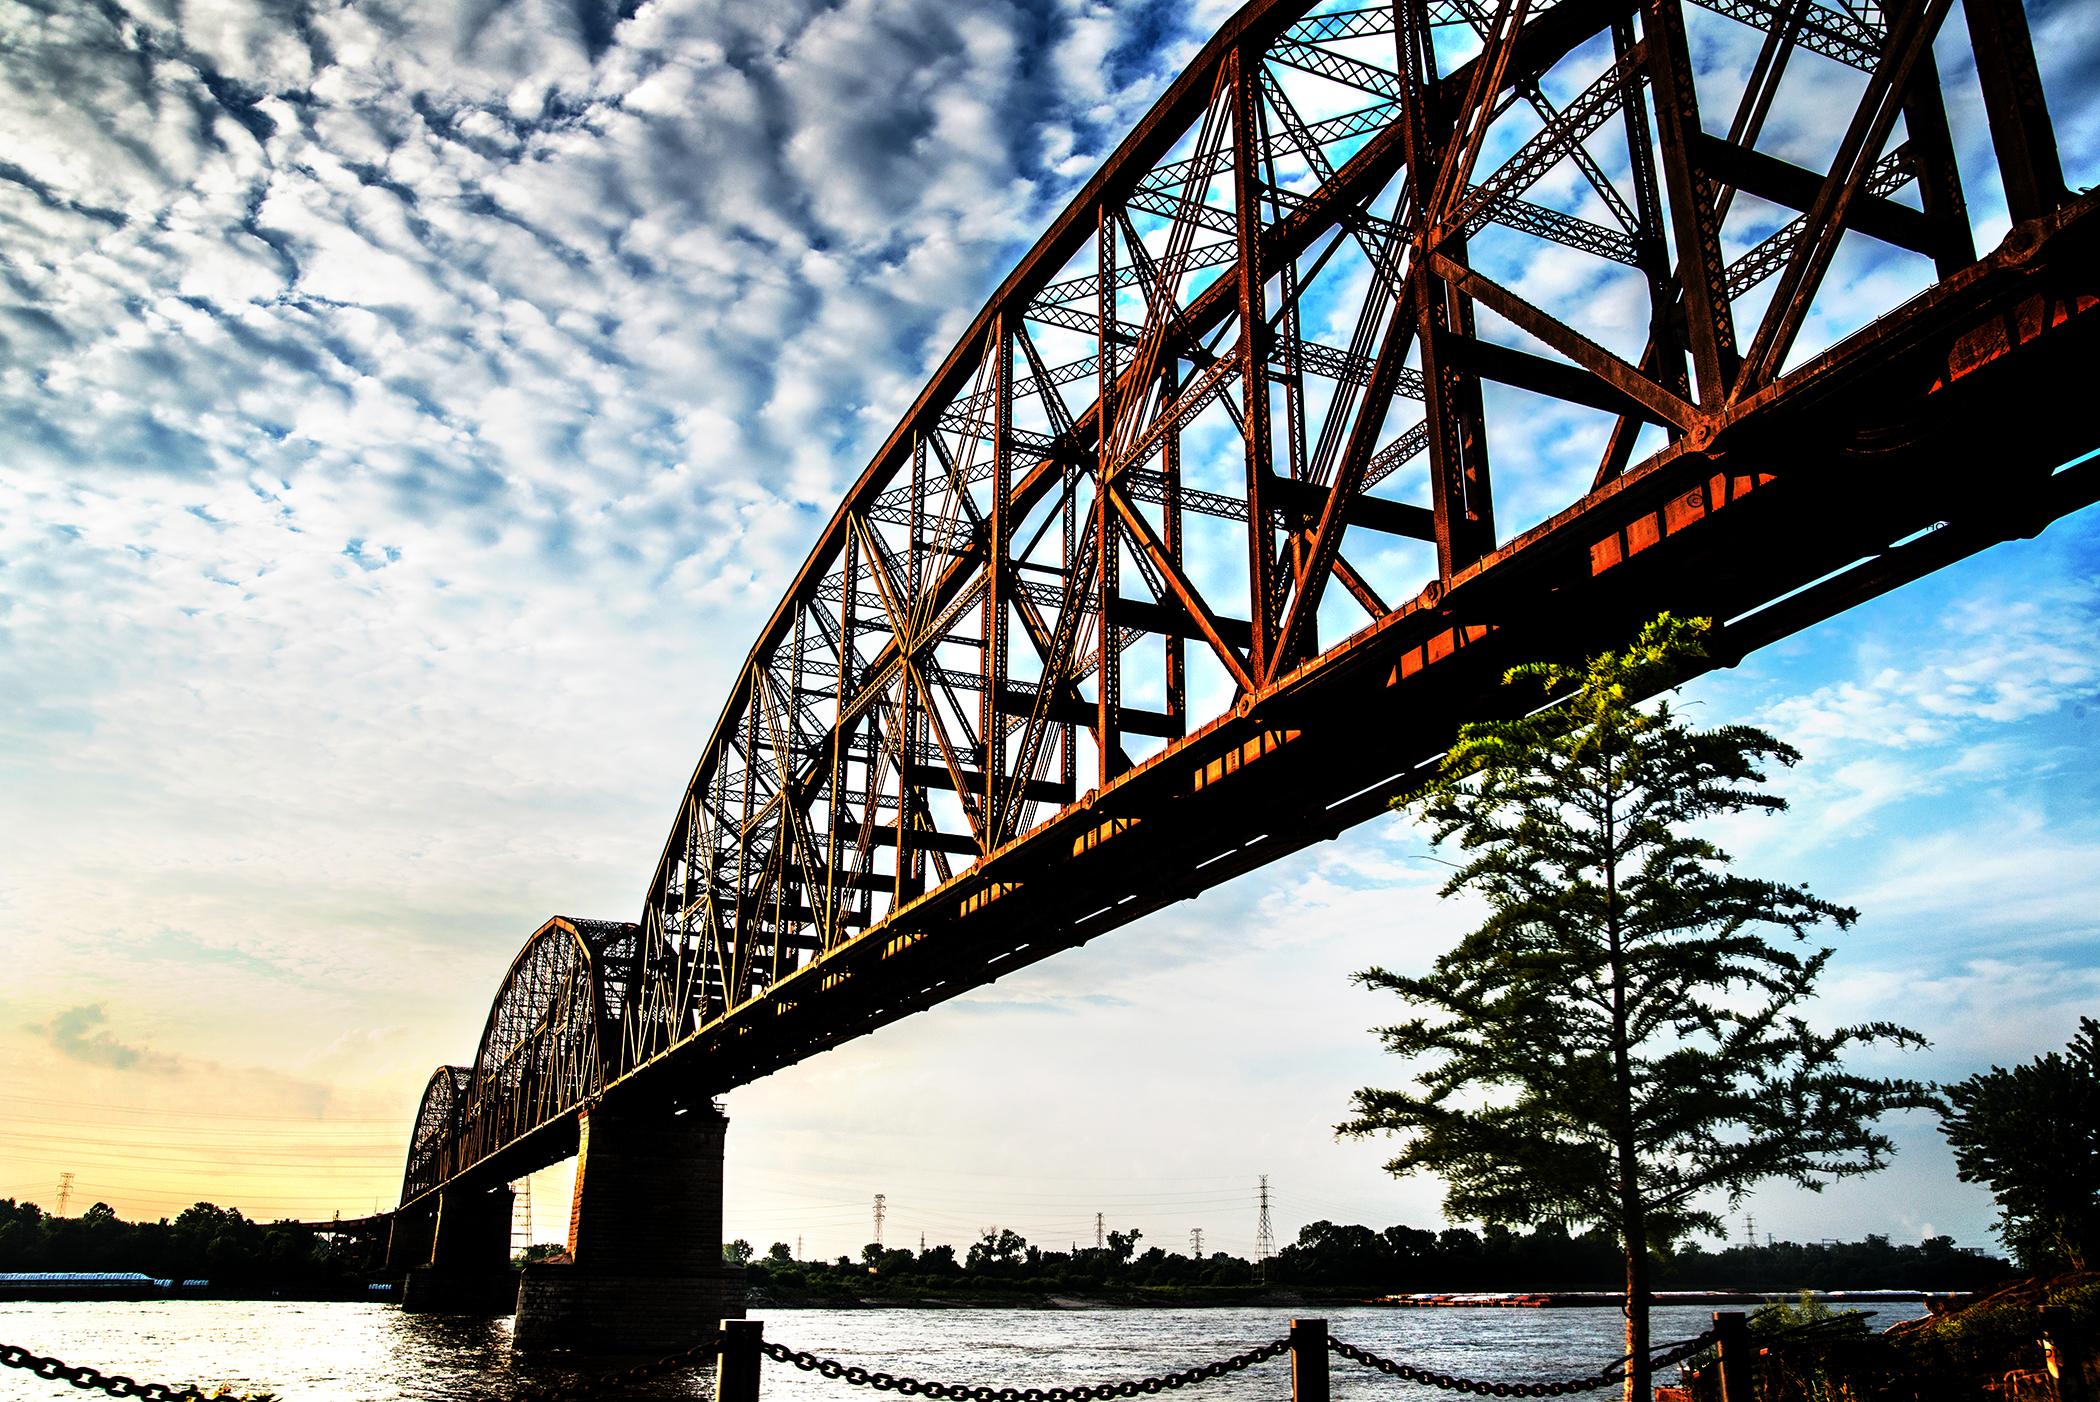 StLouis_MO_Merchant bridge_LacledesLanding_travel_Travelphotography_jbogerphotography (1).jpg